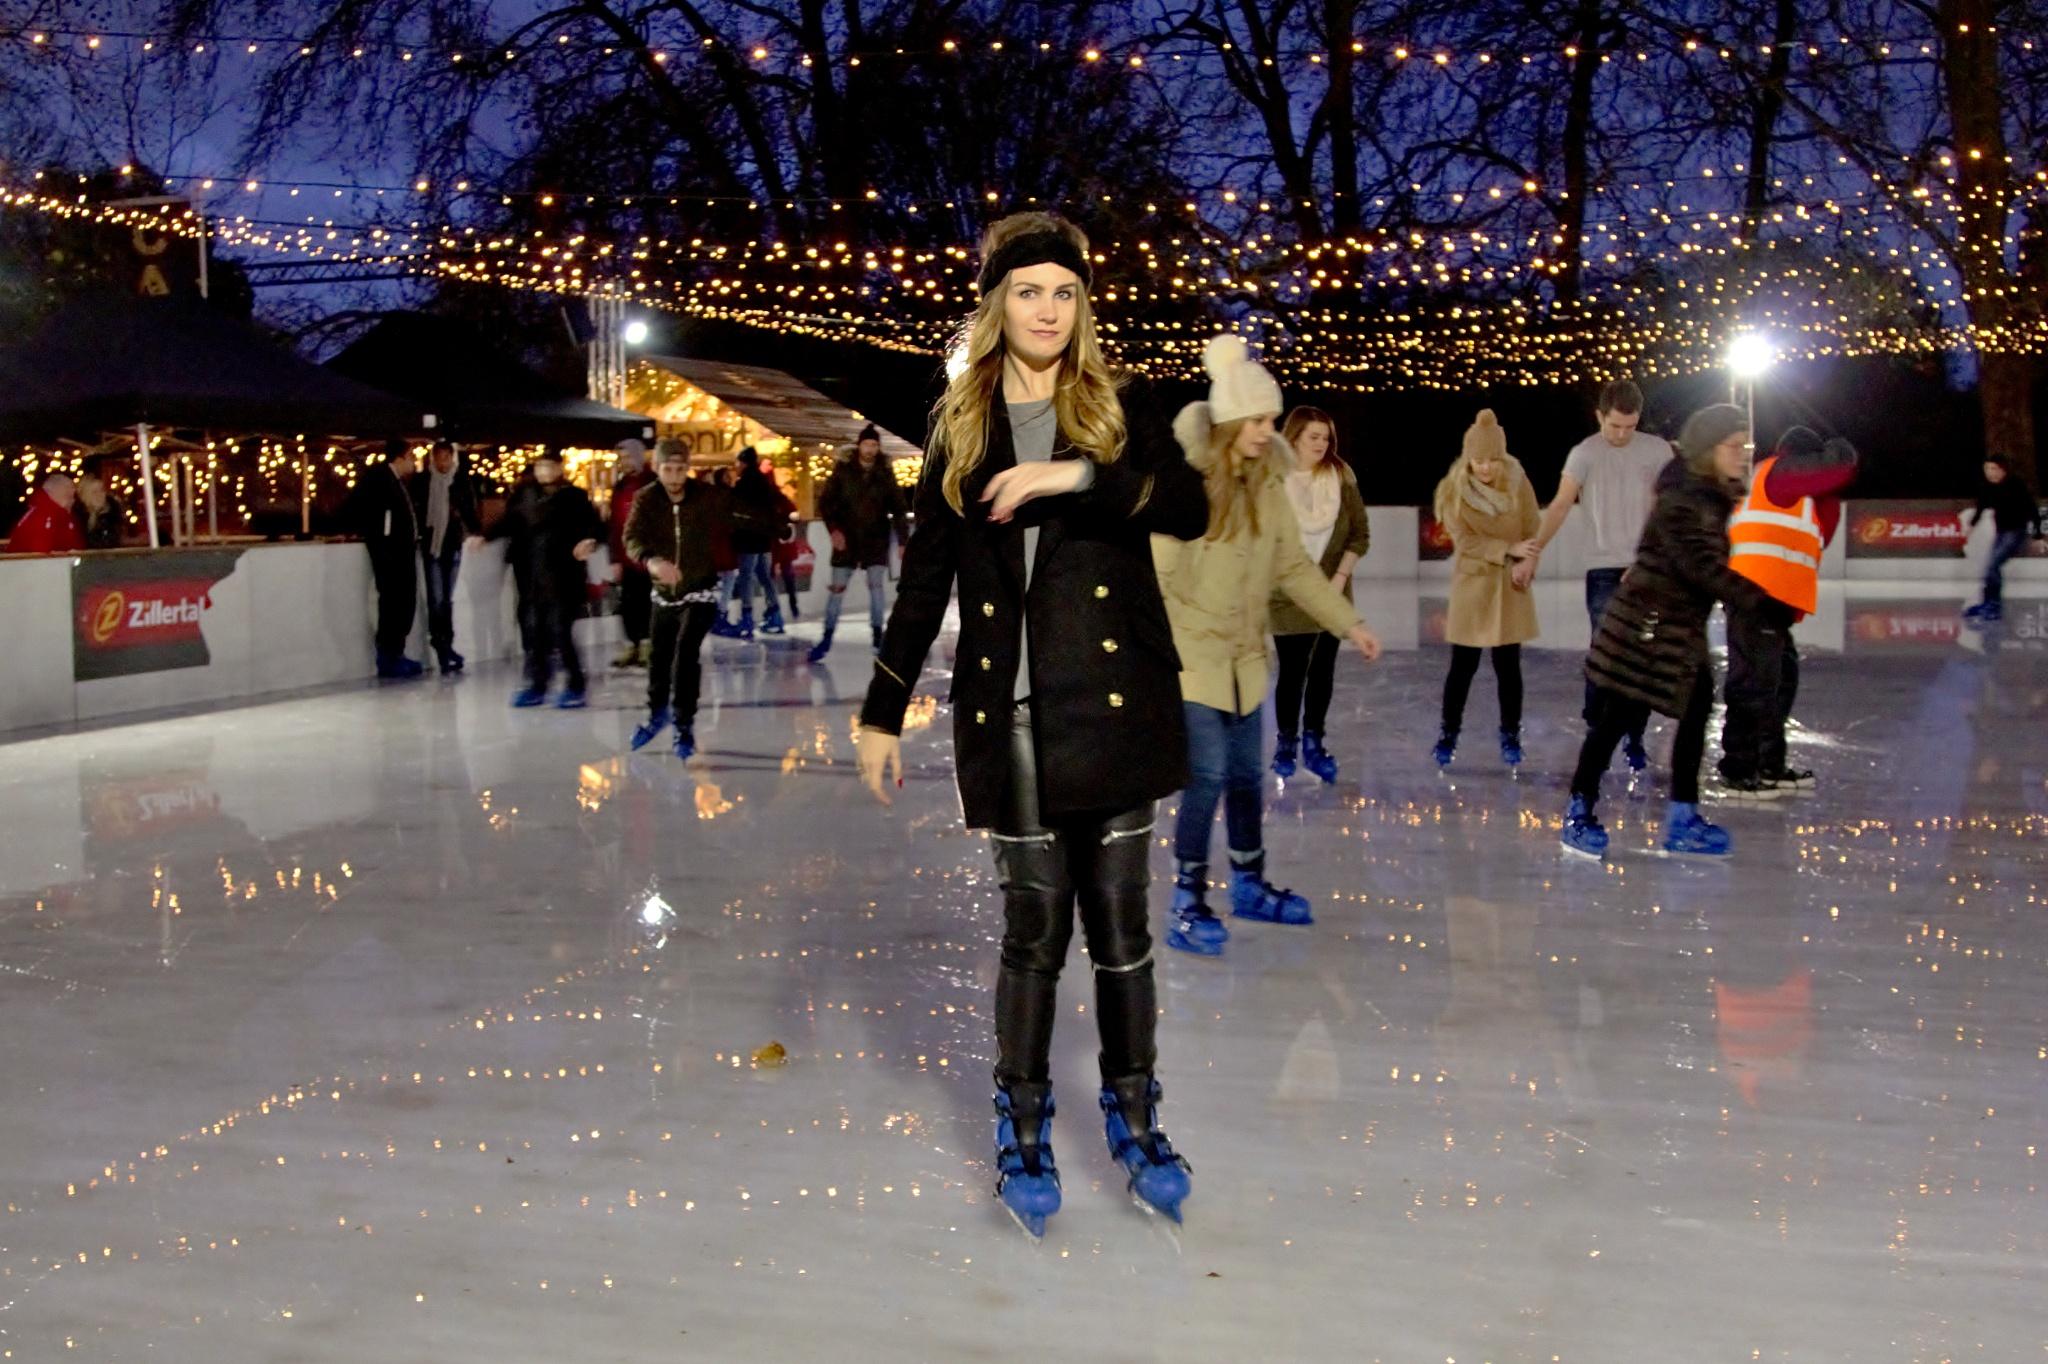 London - Hyde Park - Winterwonderland - Ice Skater - 02 - Colour by paul.hosker